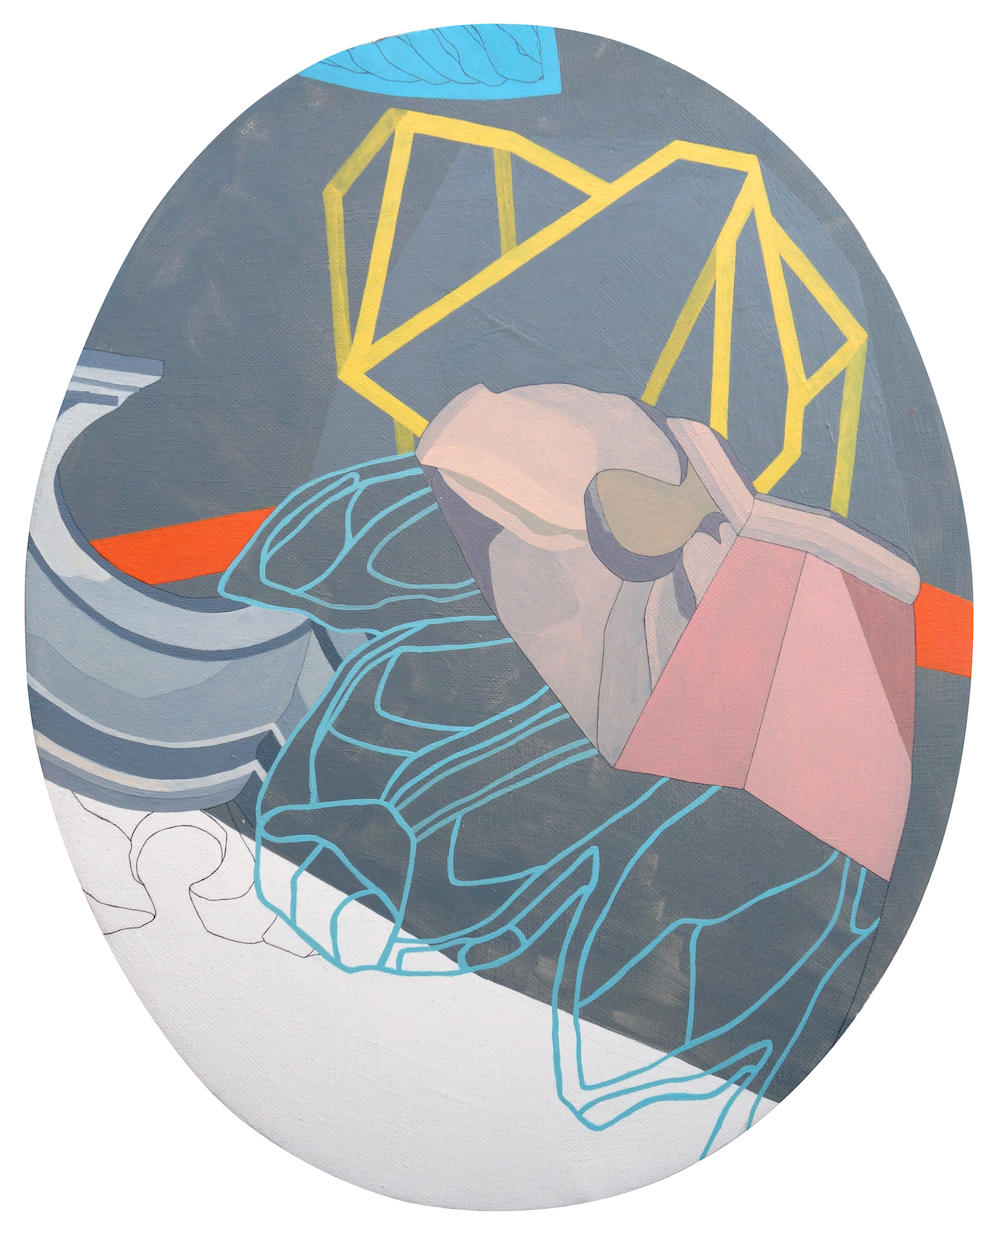 10- ST (Serie Drapeados) Óleo y grafito sobre tela 33,6 x 27 cm 2016